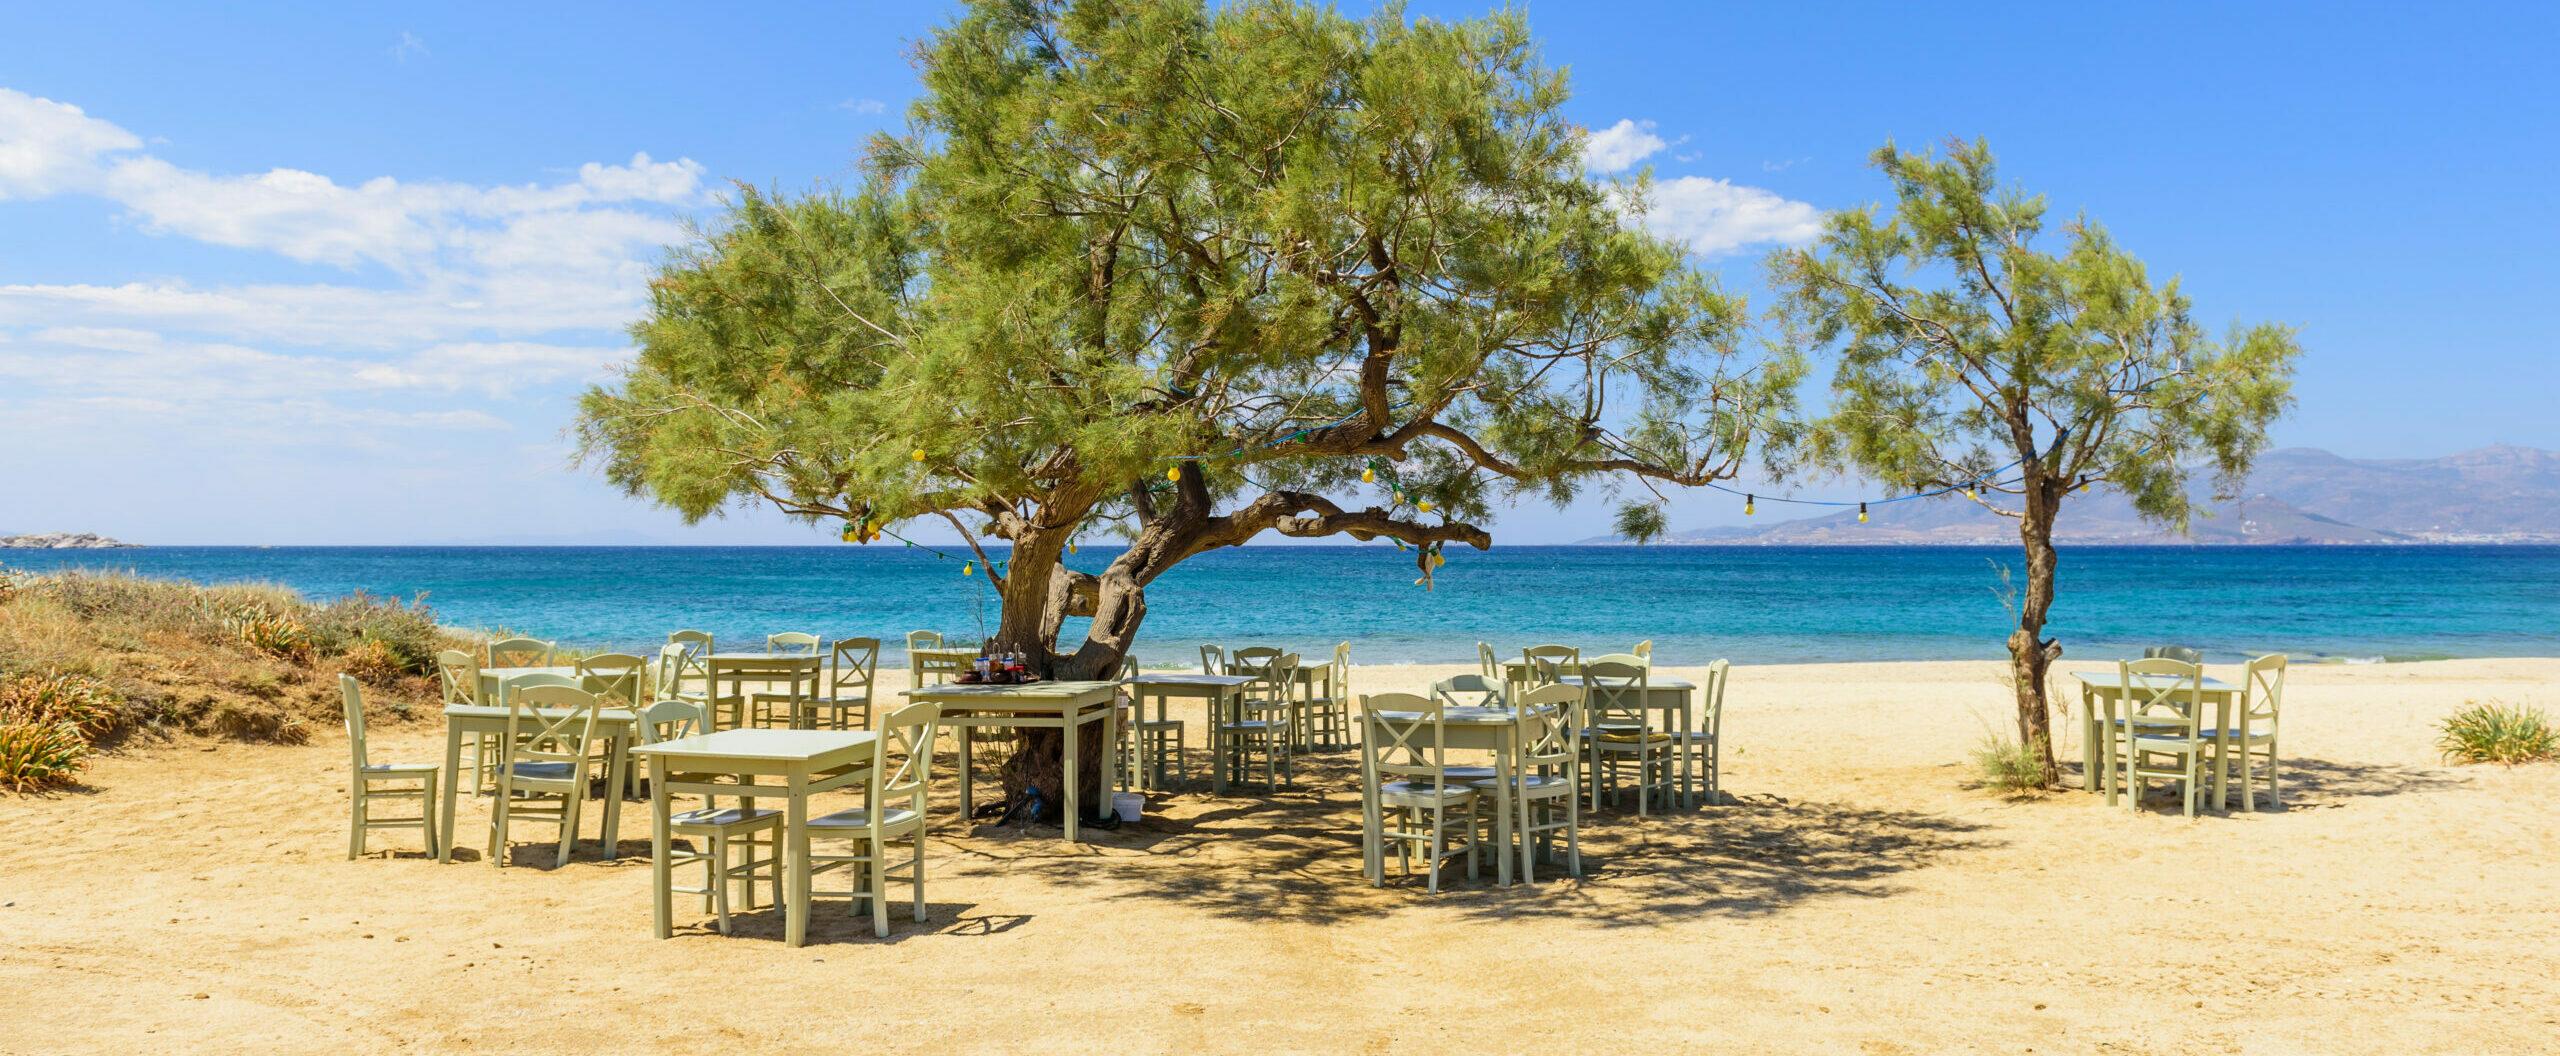 Naxiotikos Kalogeros (the Monk of Naxos) is the secret of the gastronomy of the island